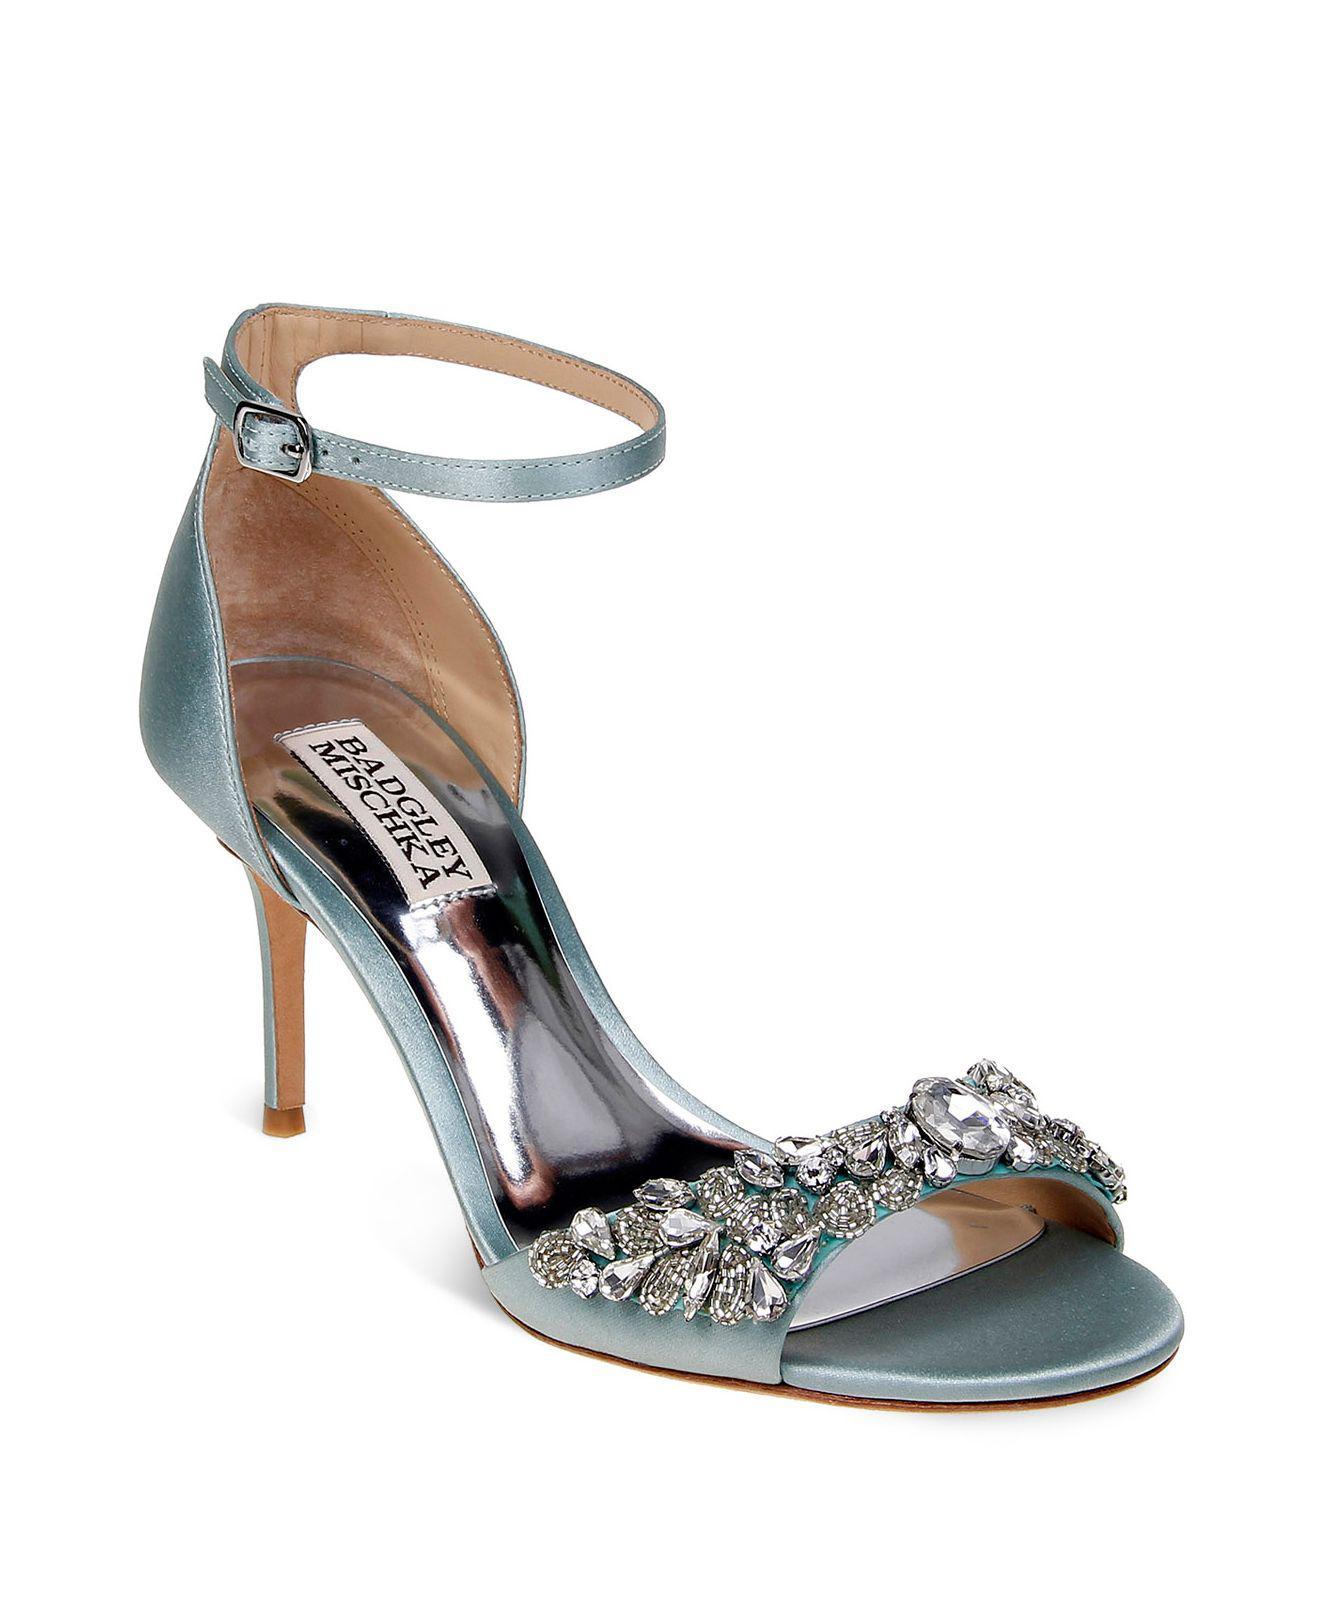 0647d9879be Lyst - Badgley Mischka Bankston Satin Embellished Ankle Strap High ...